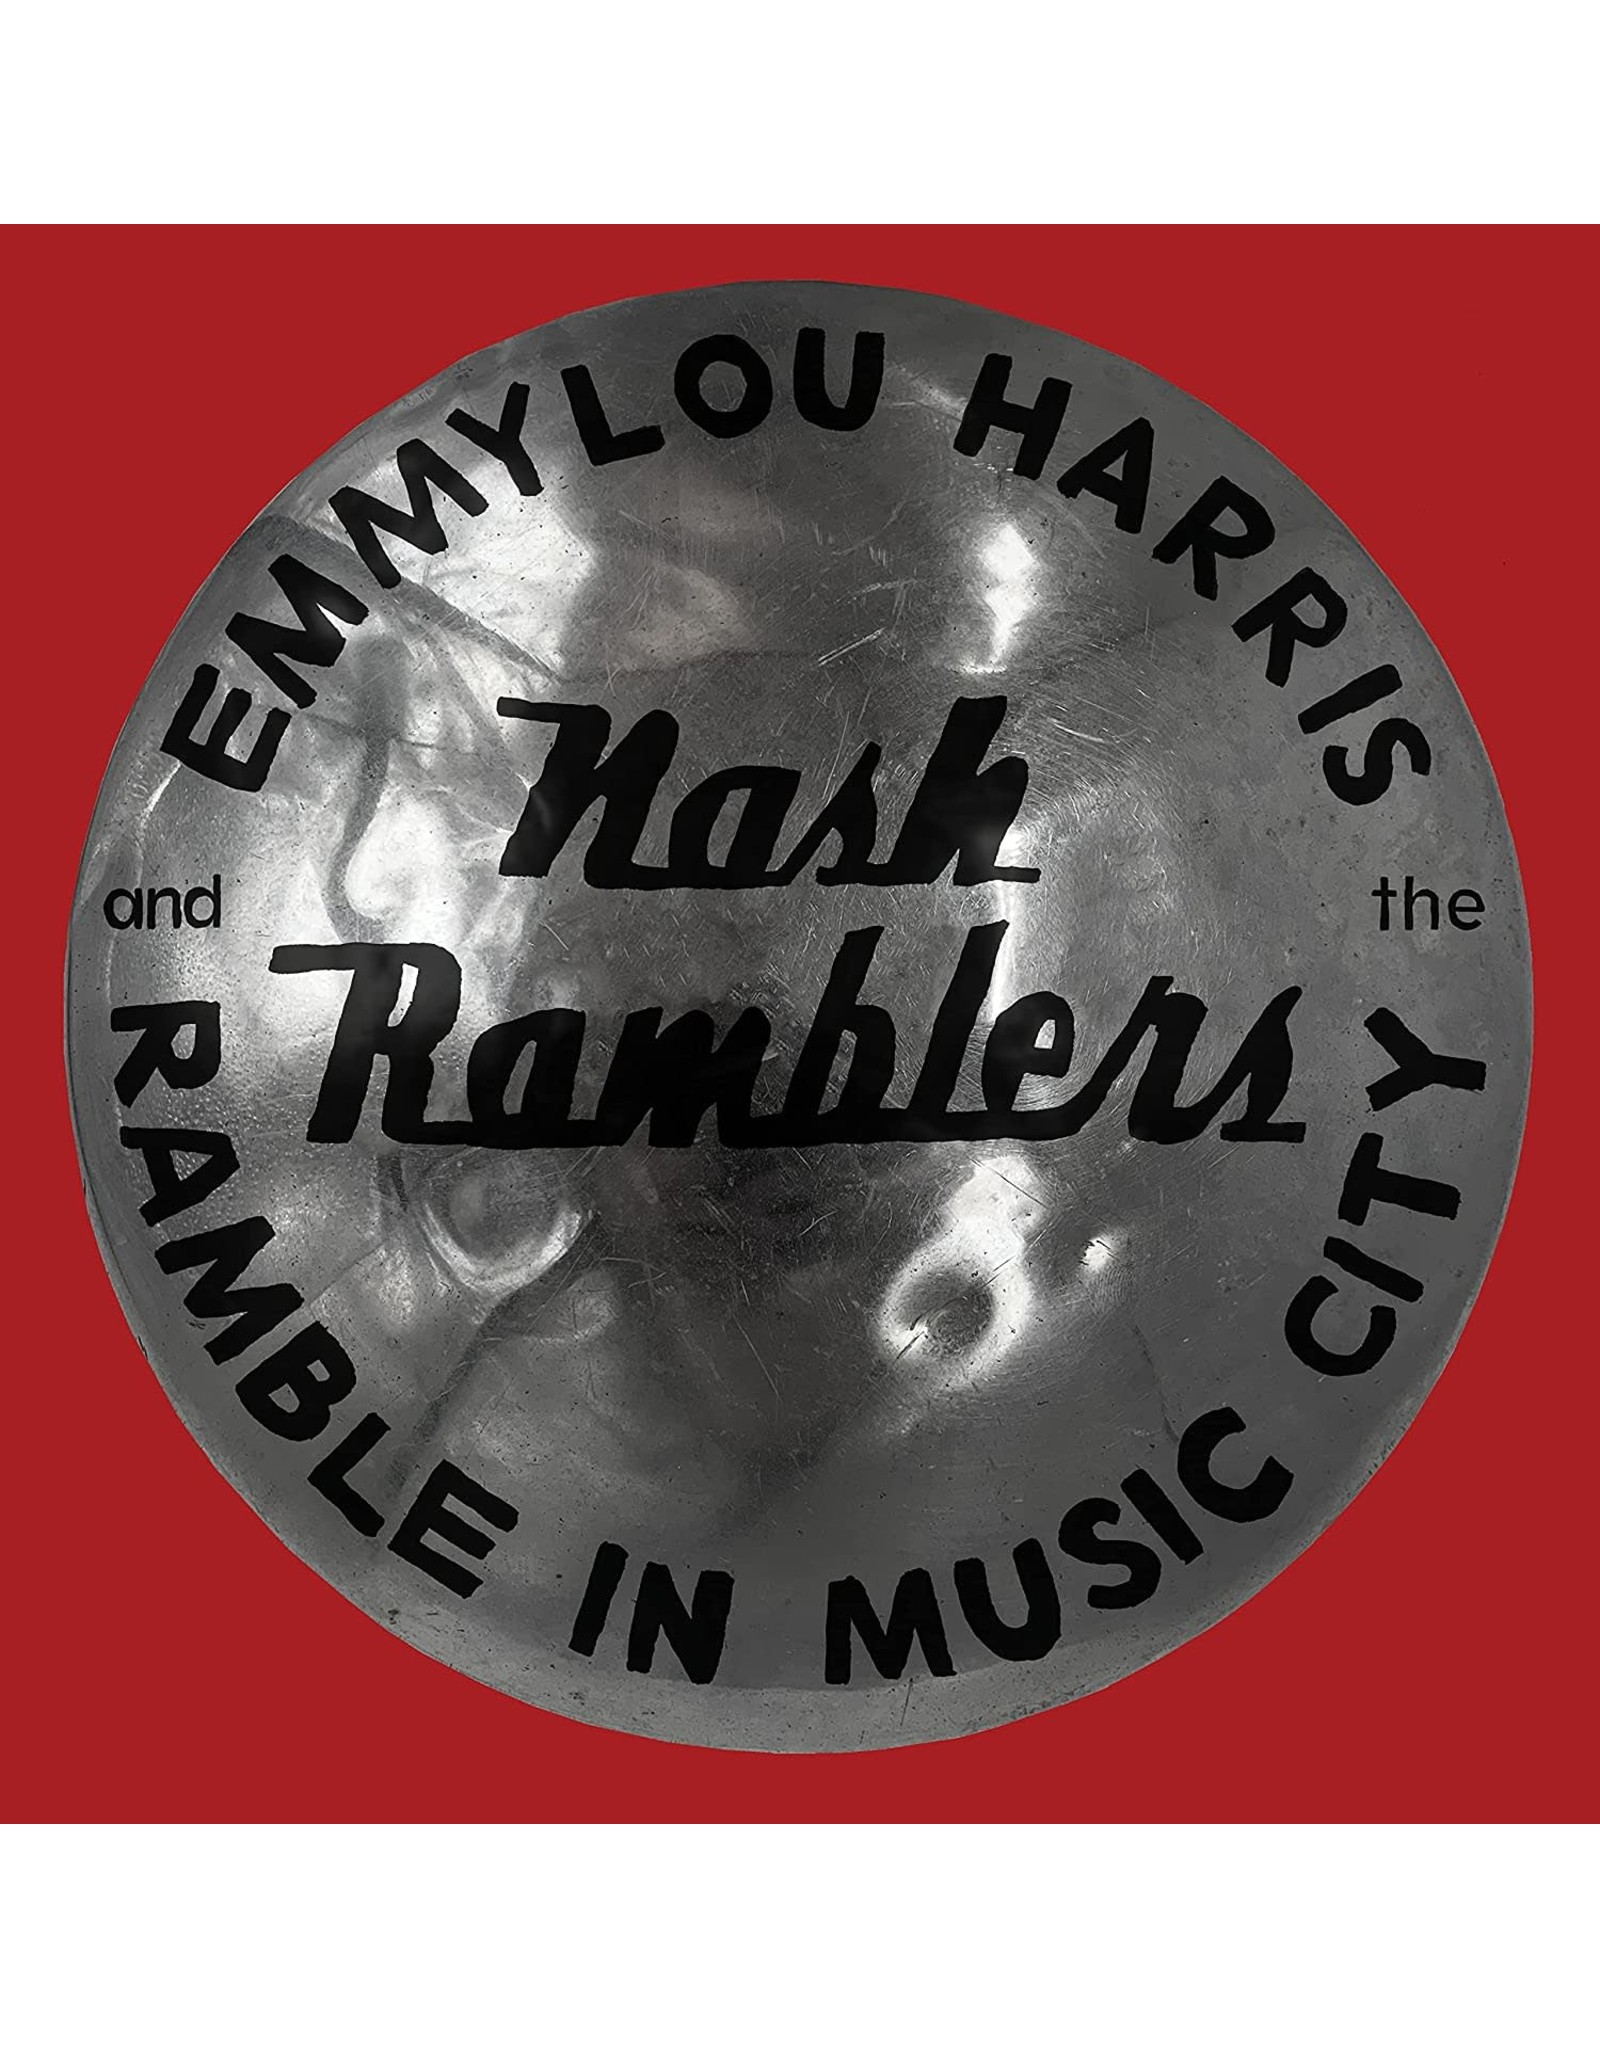 Harris, Emmylou & The Nash Ramblers - Ramble in Music City CD